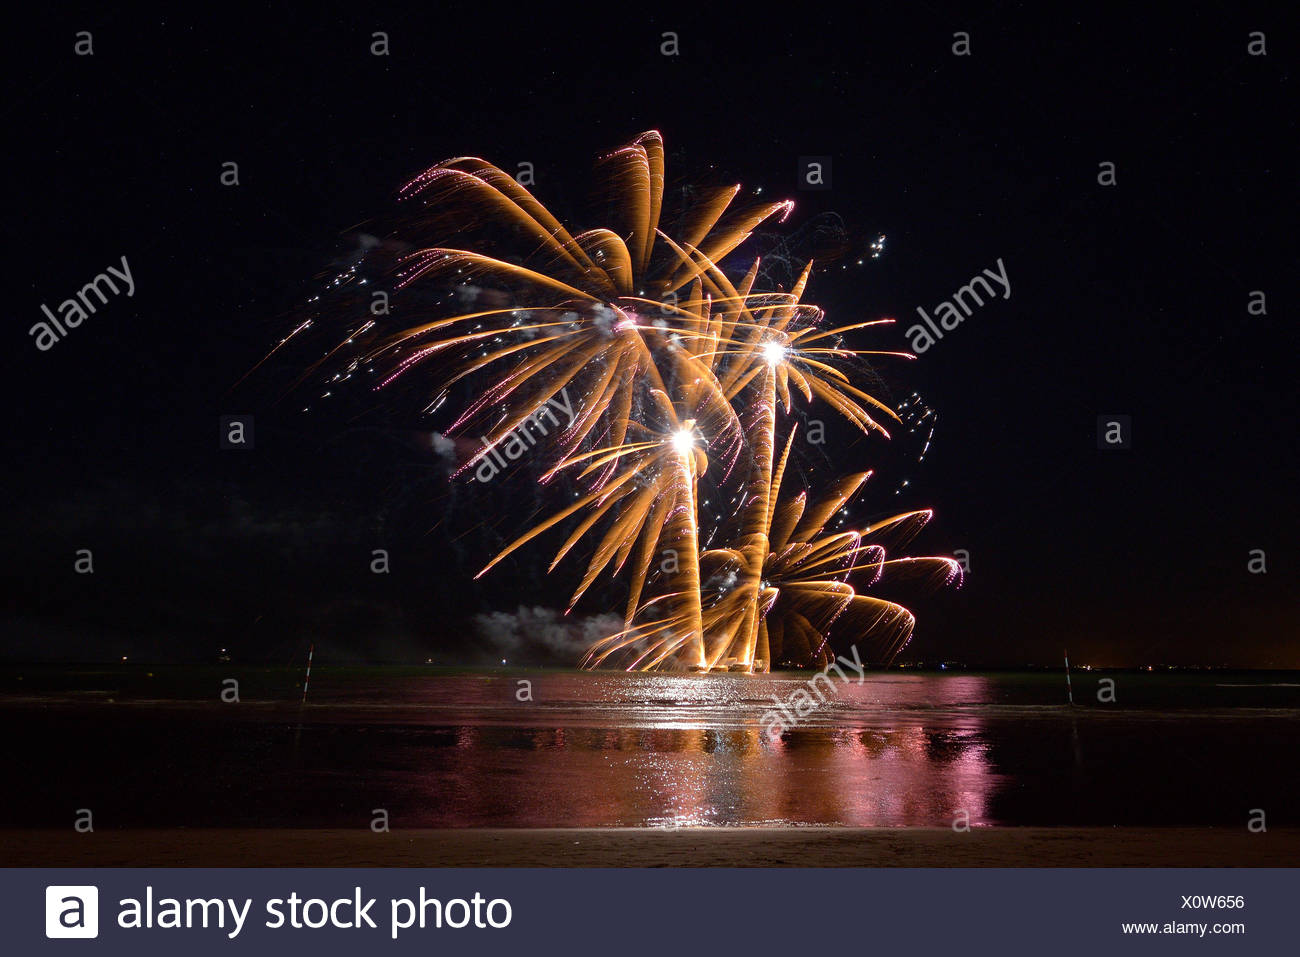 night fireworks generates palms - Stock Image